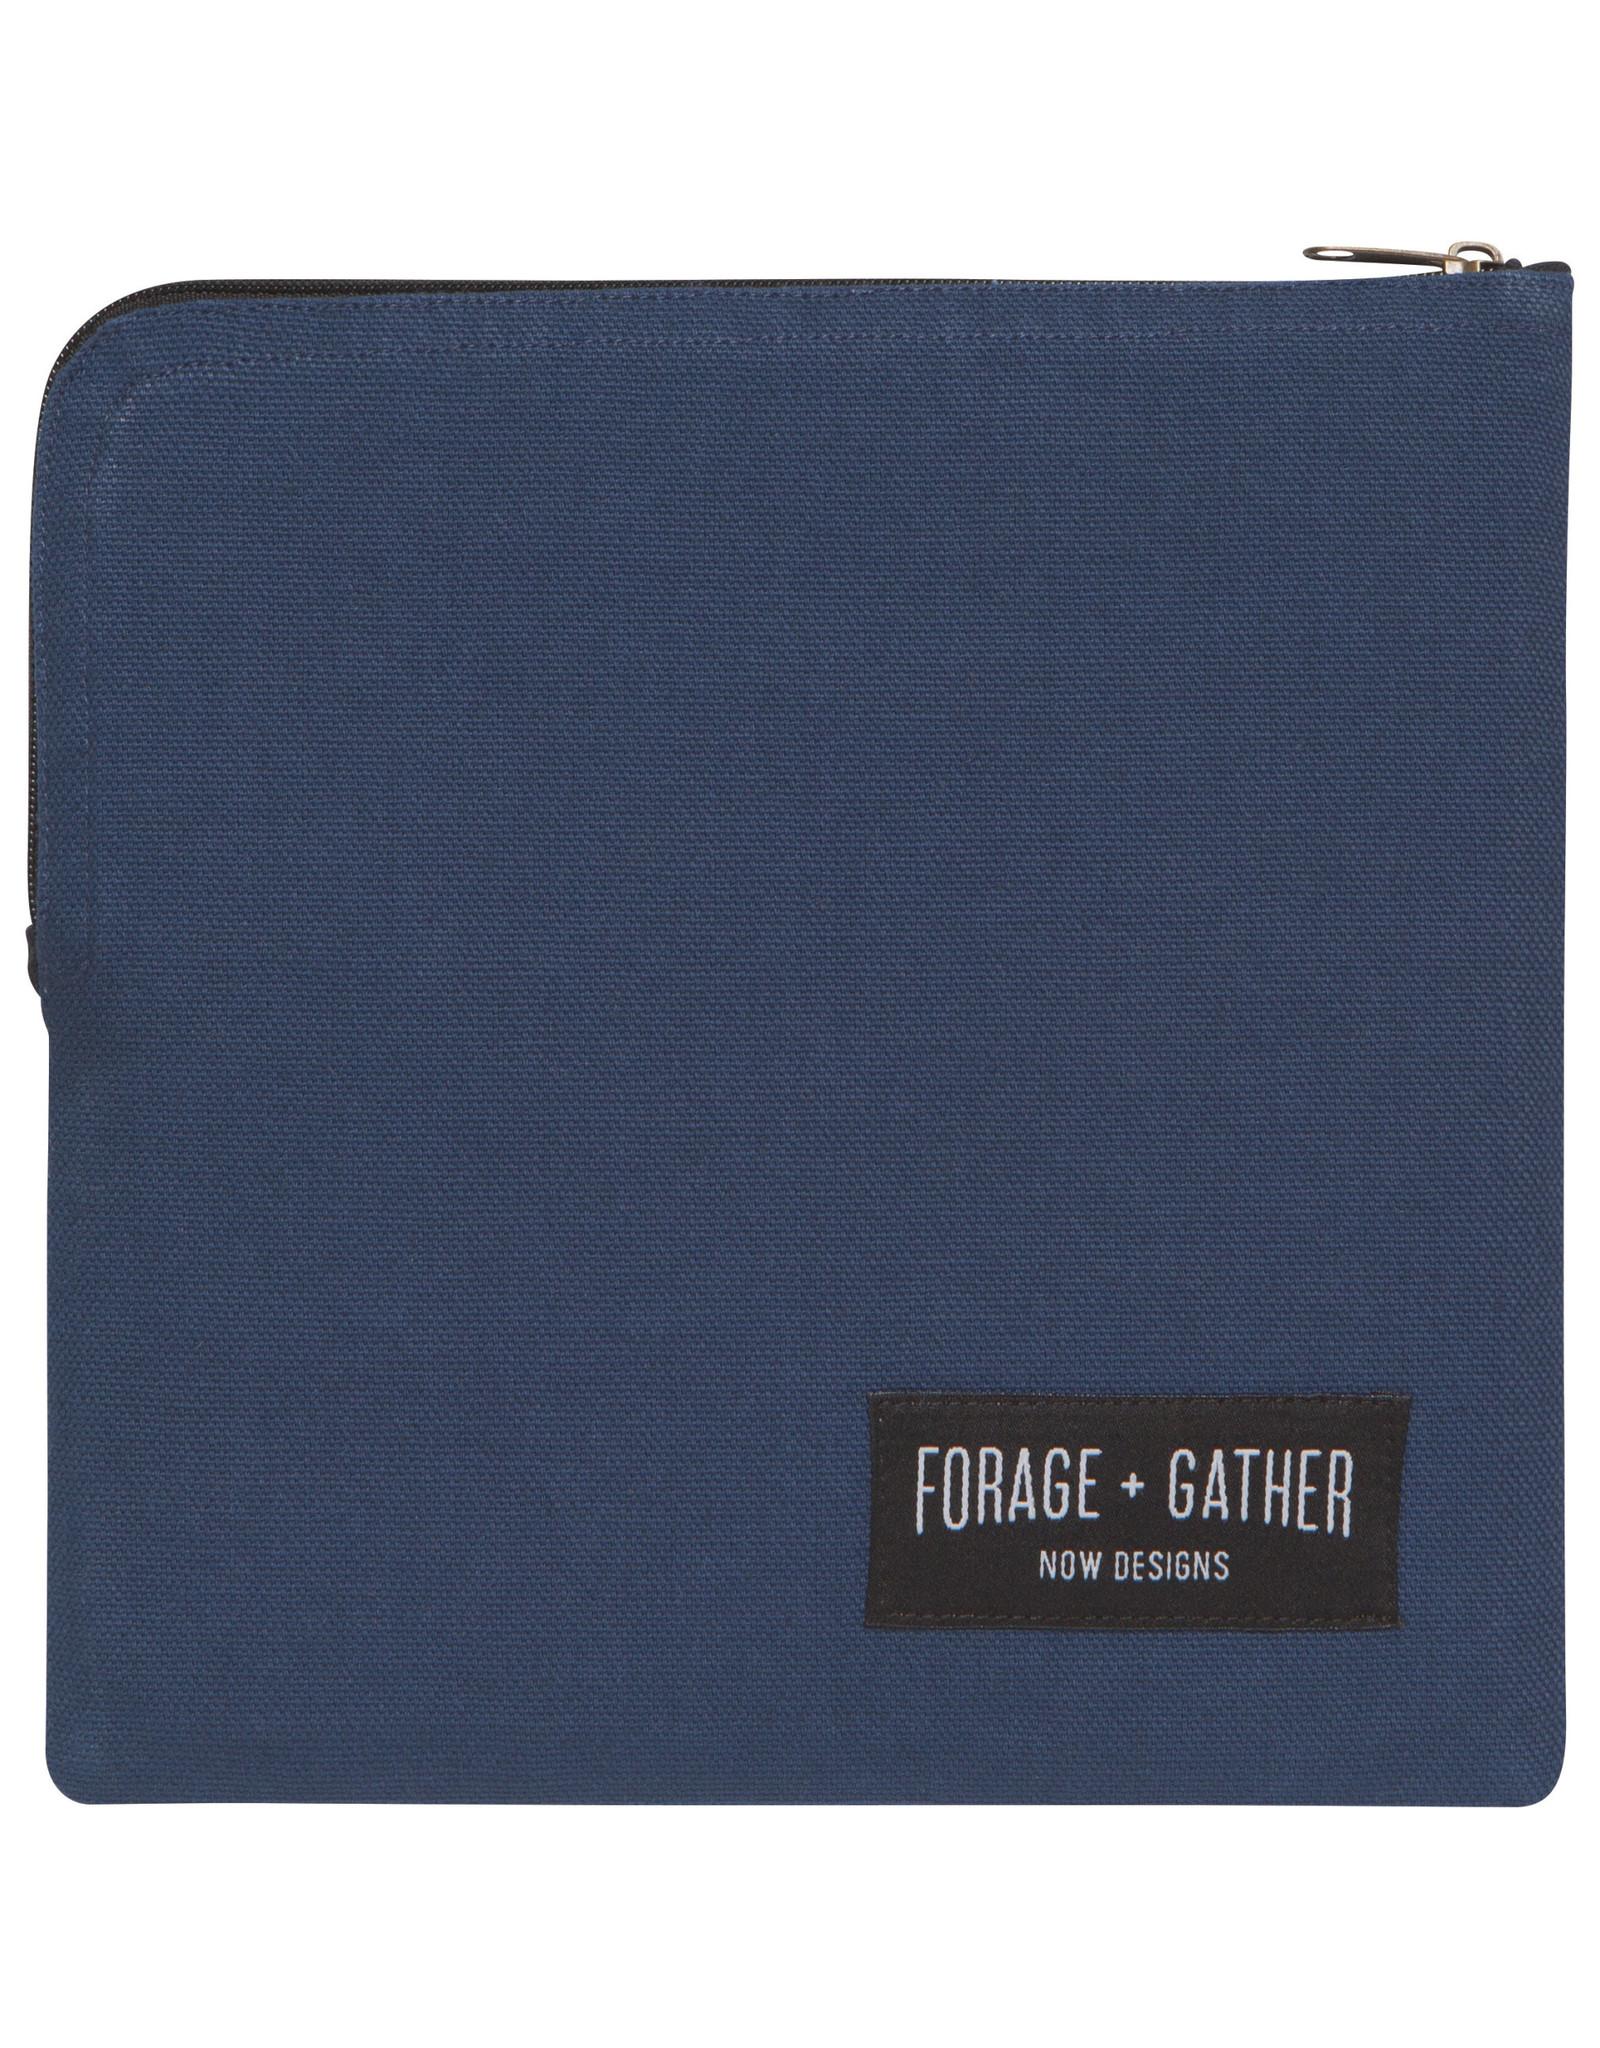 Danica - Forage + Gather Snack Bag - Blue